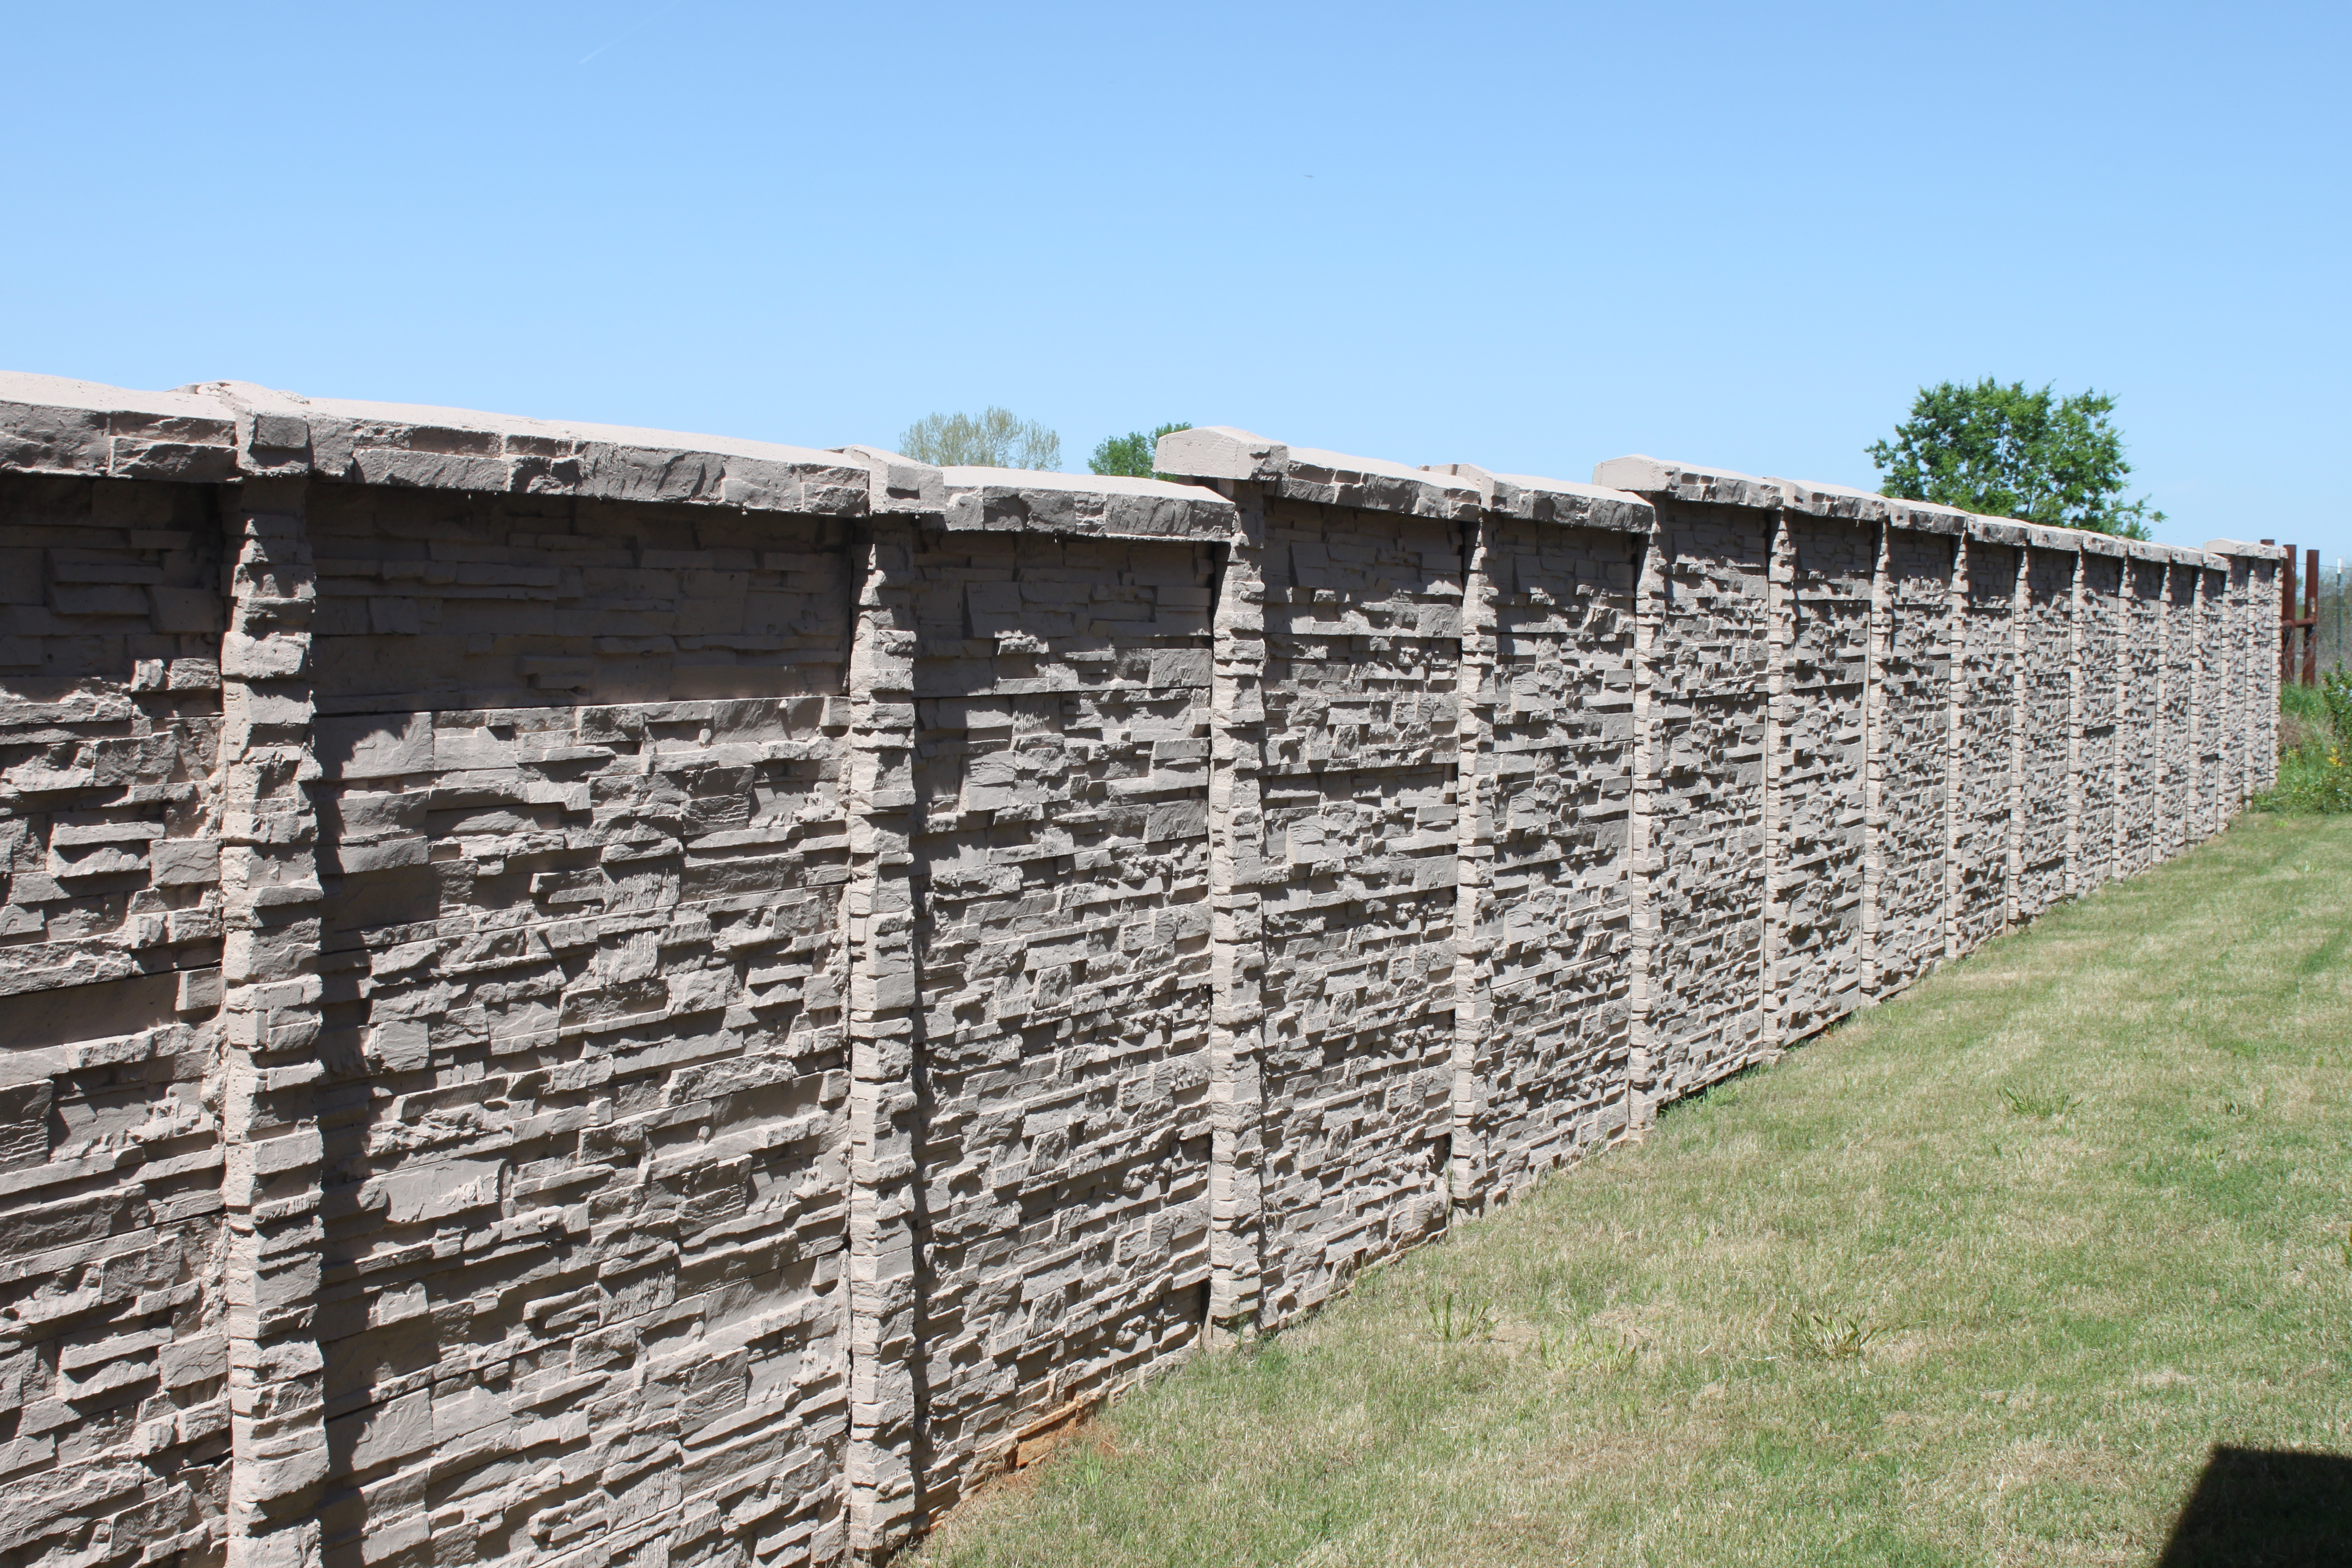 ChiselStone Concrete Screening Wall